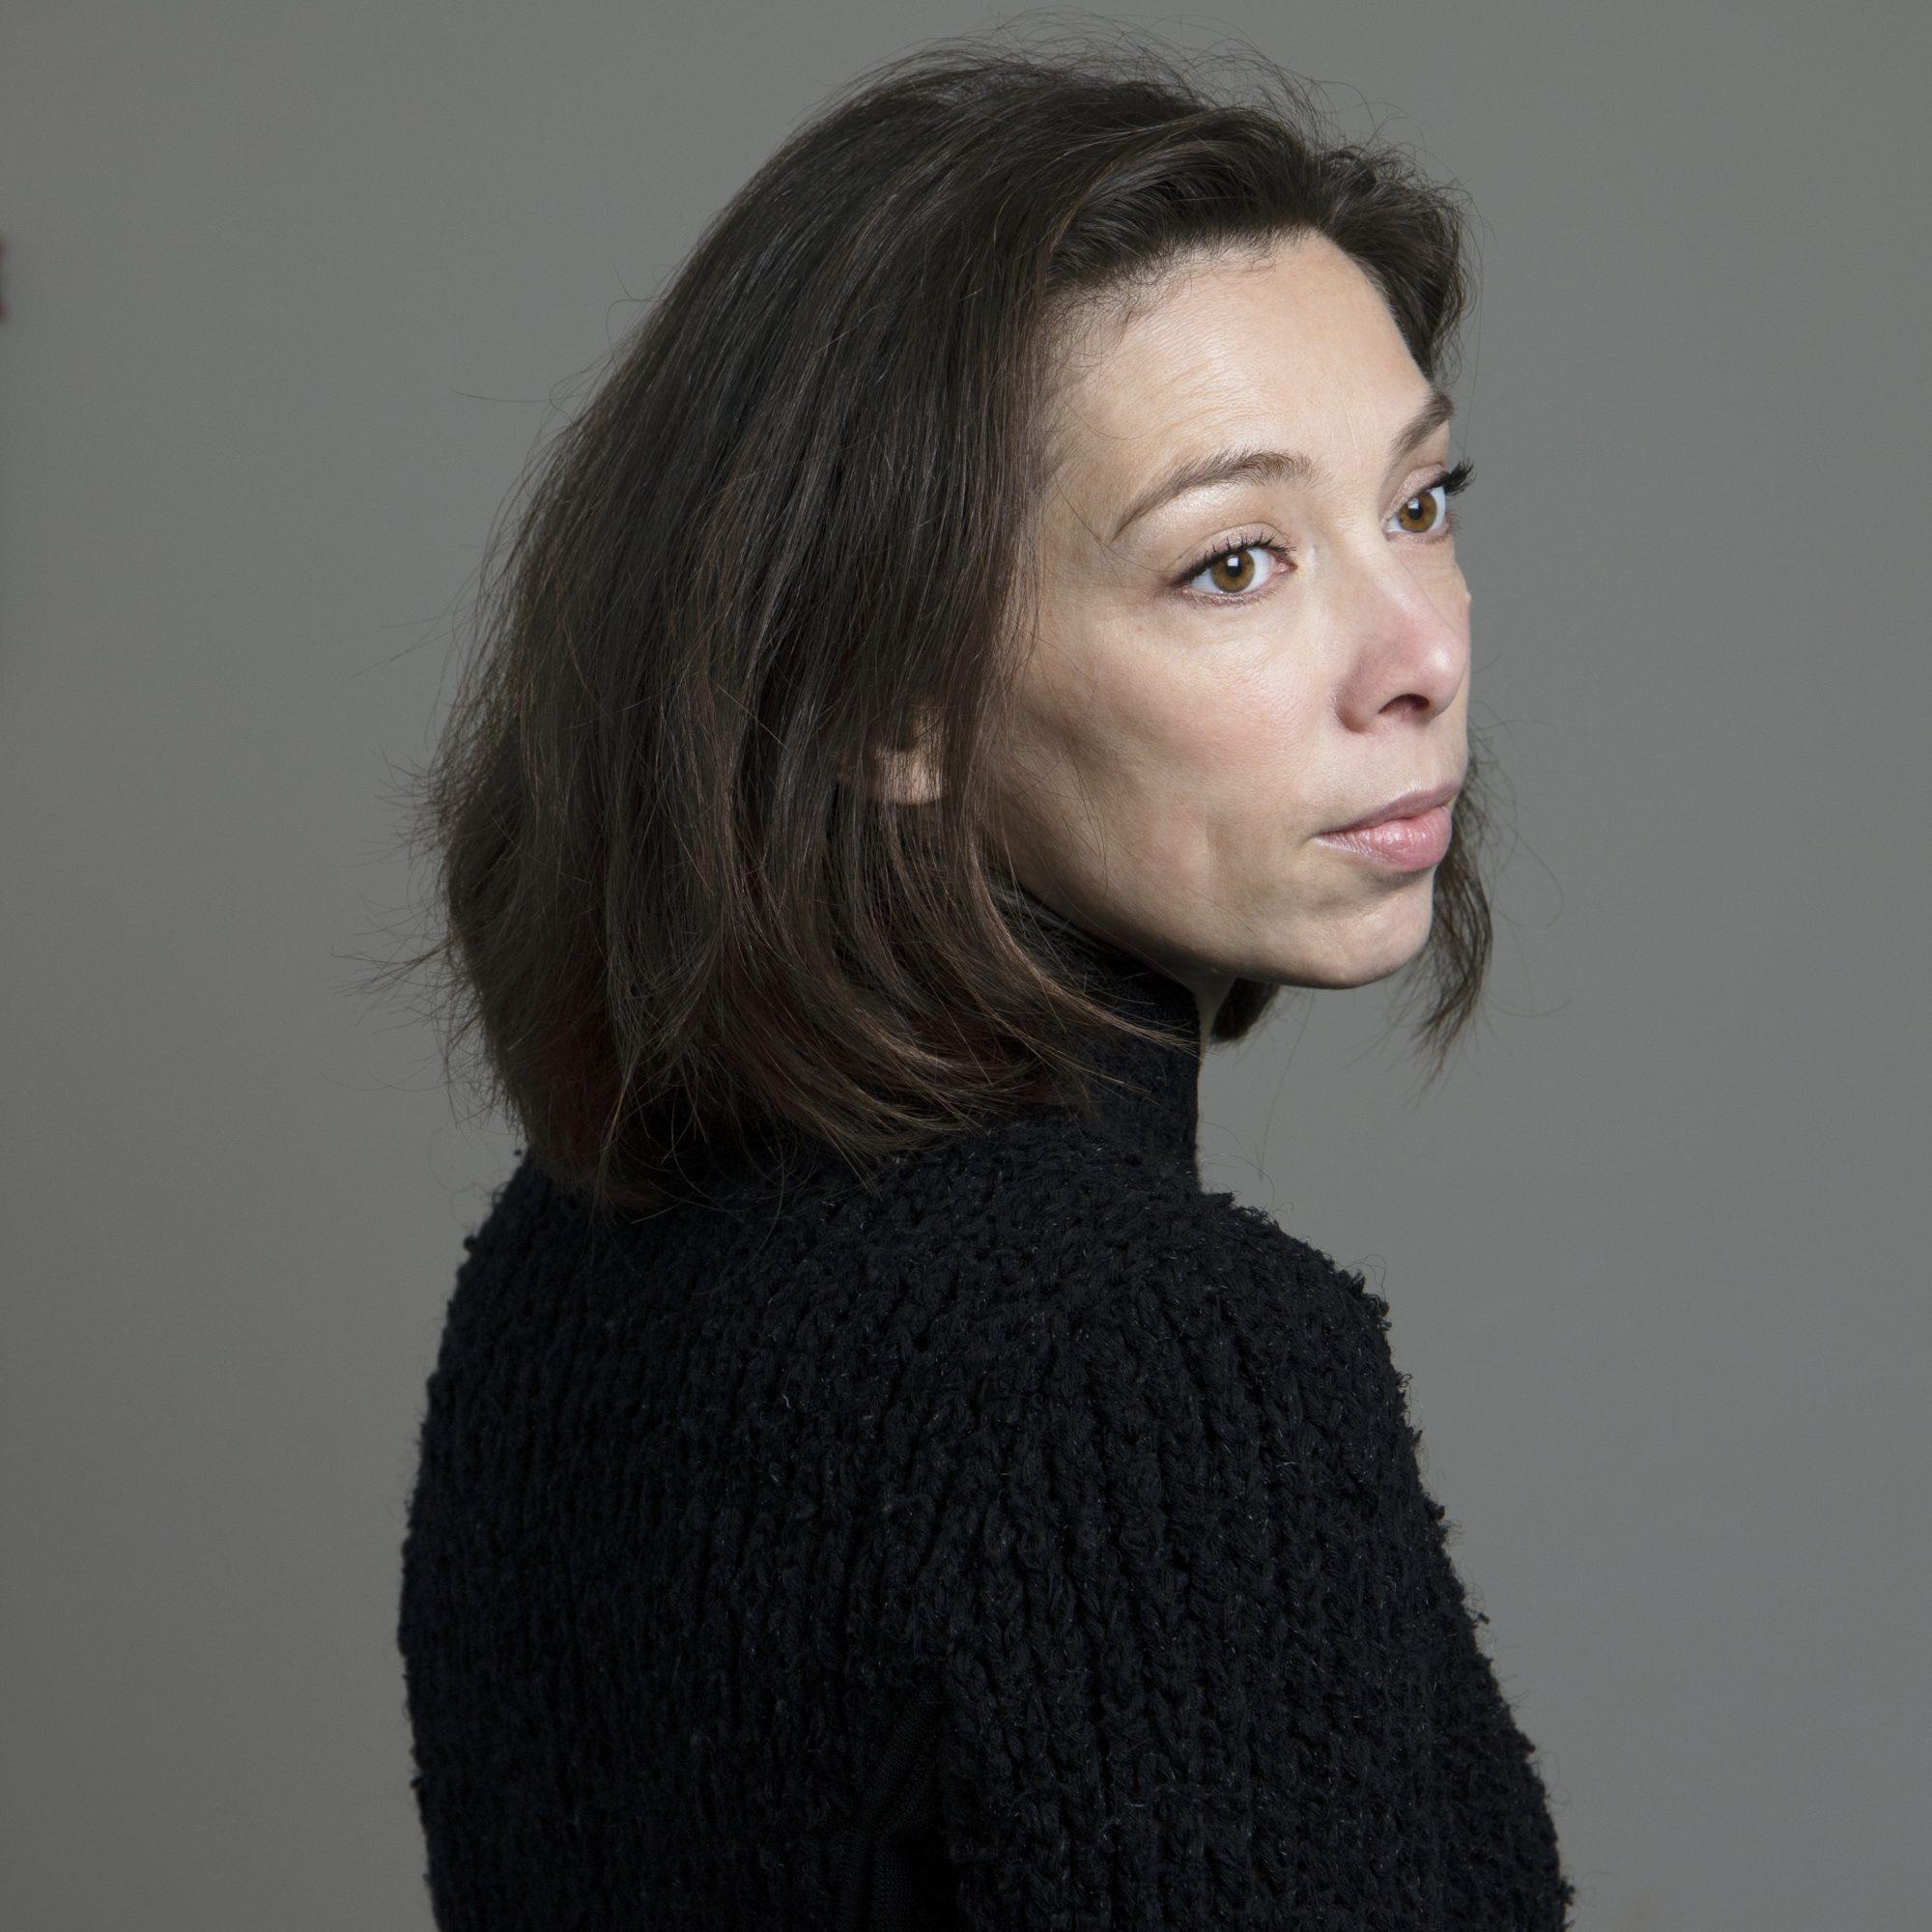 Leonor De Recondo